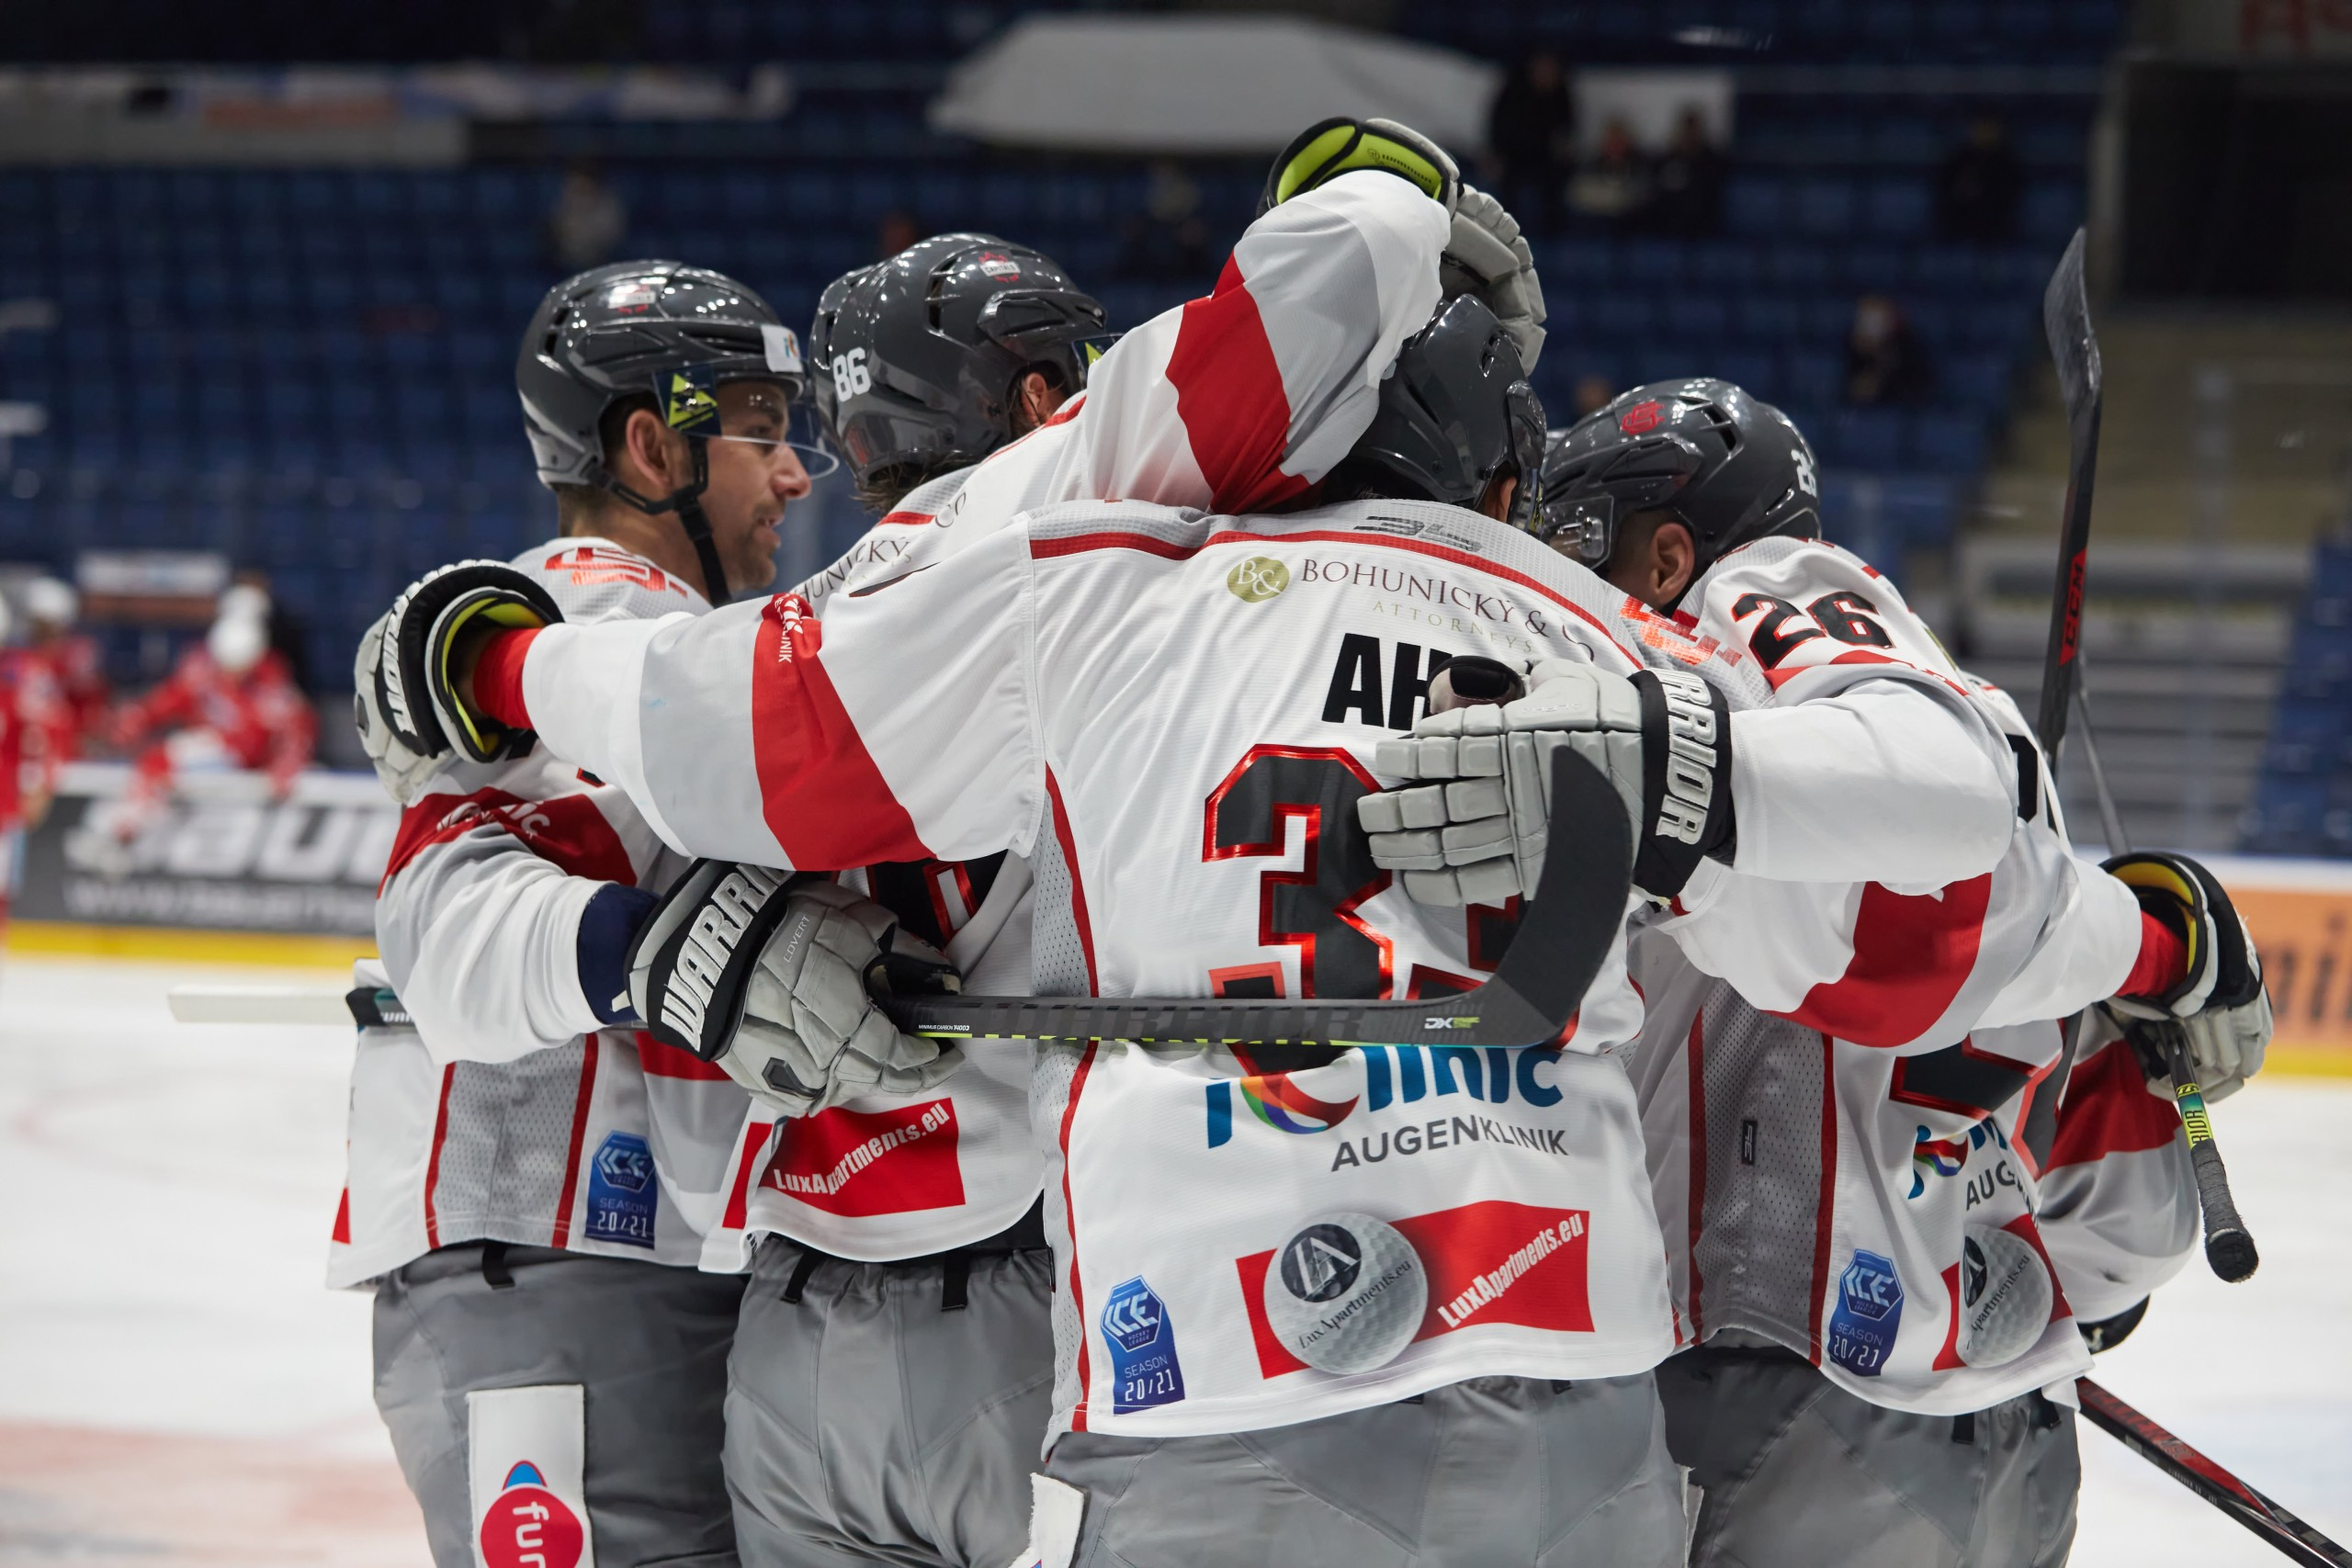 CAPITALS zastavili víťaznú šnúru Innsbrucku